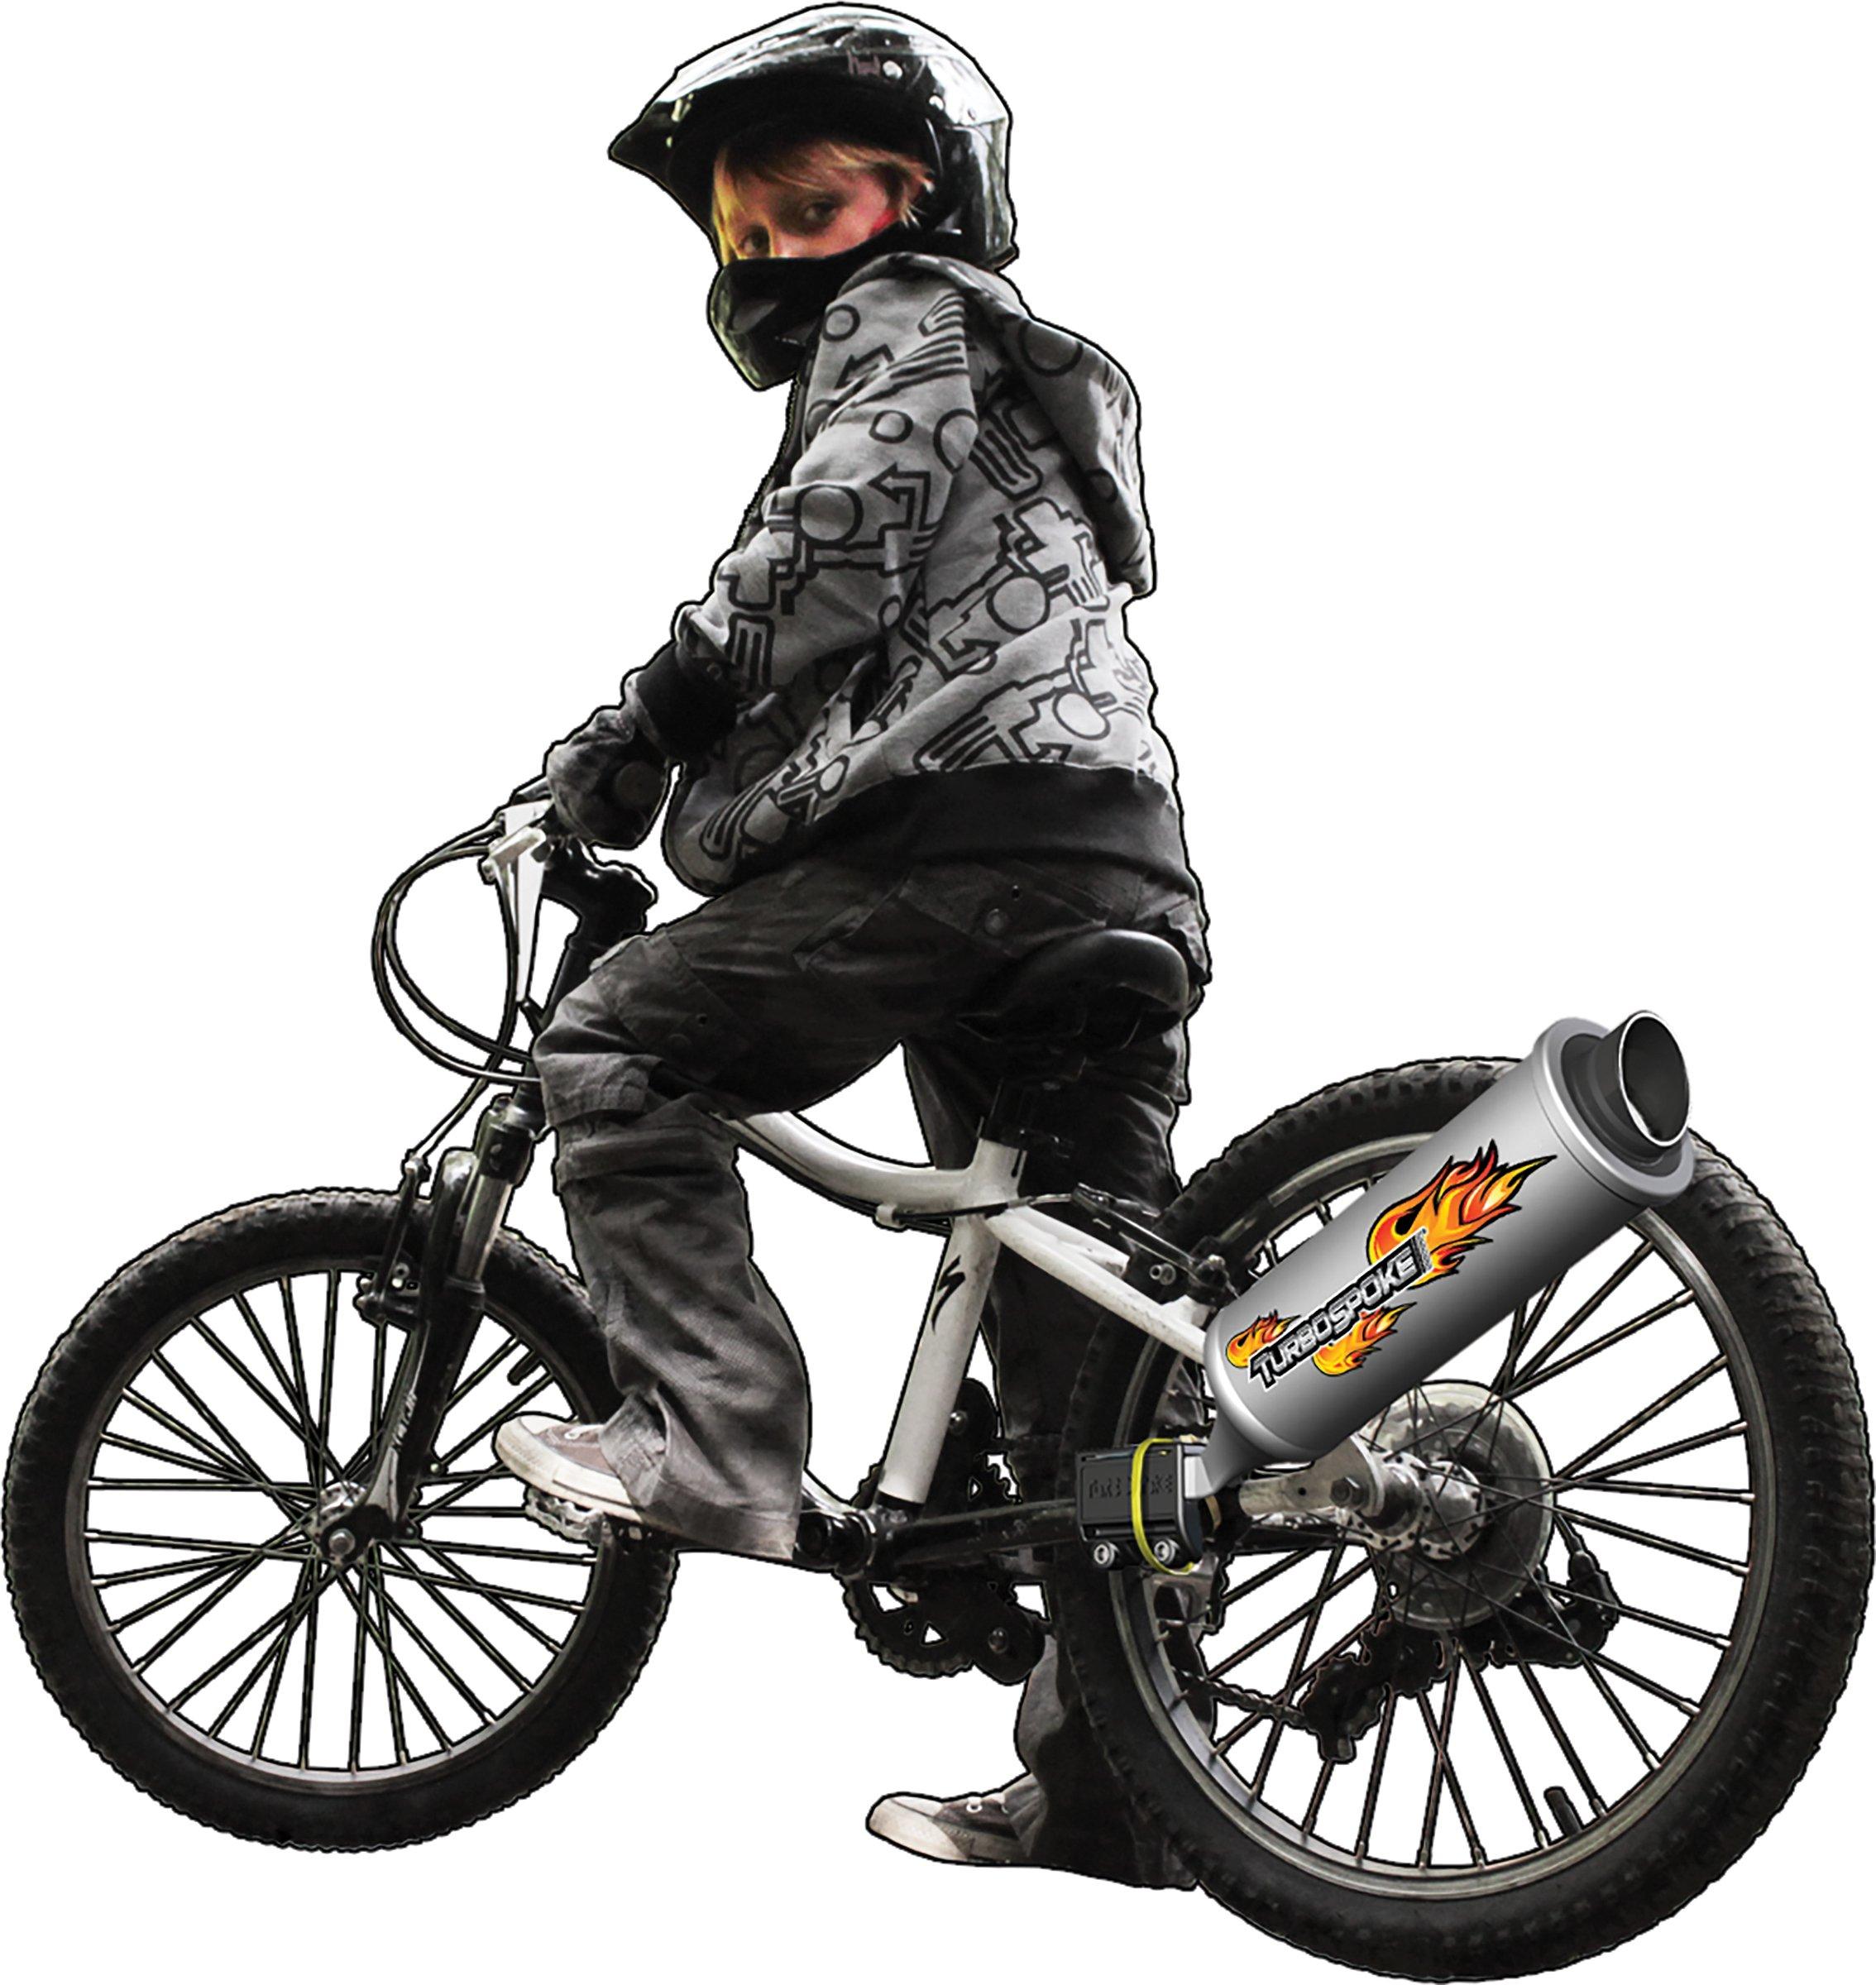 Turbospoke Bicycle Exhaust System (Original Updated) by Turbospoke (Image #5)